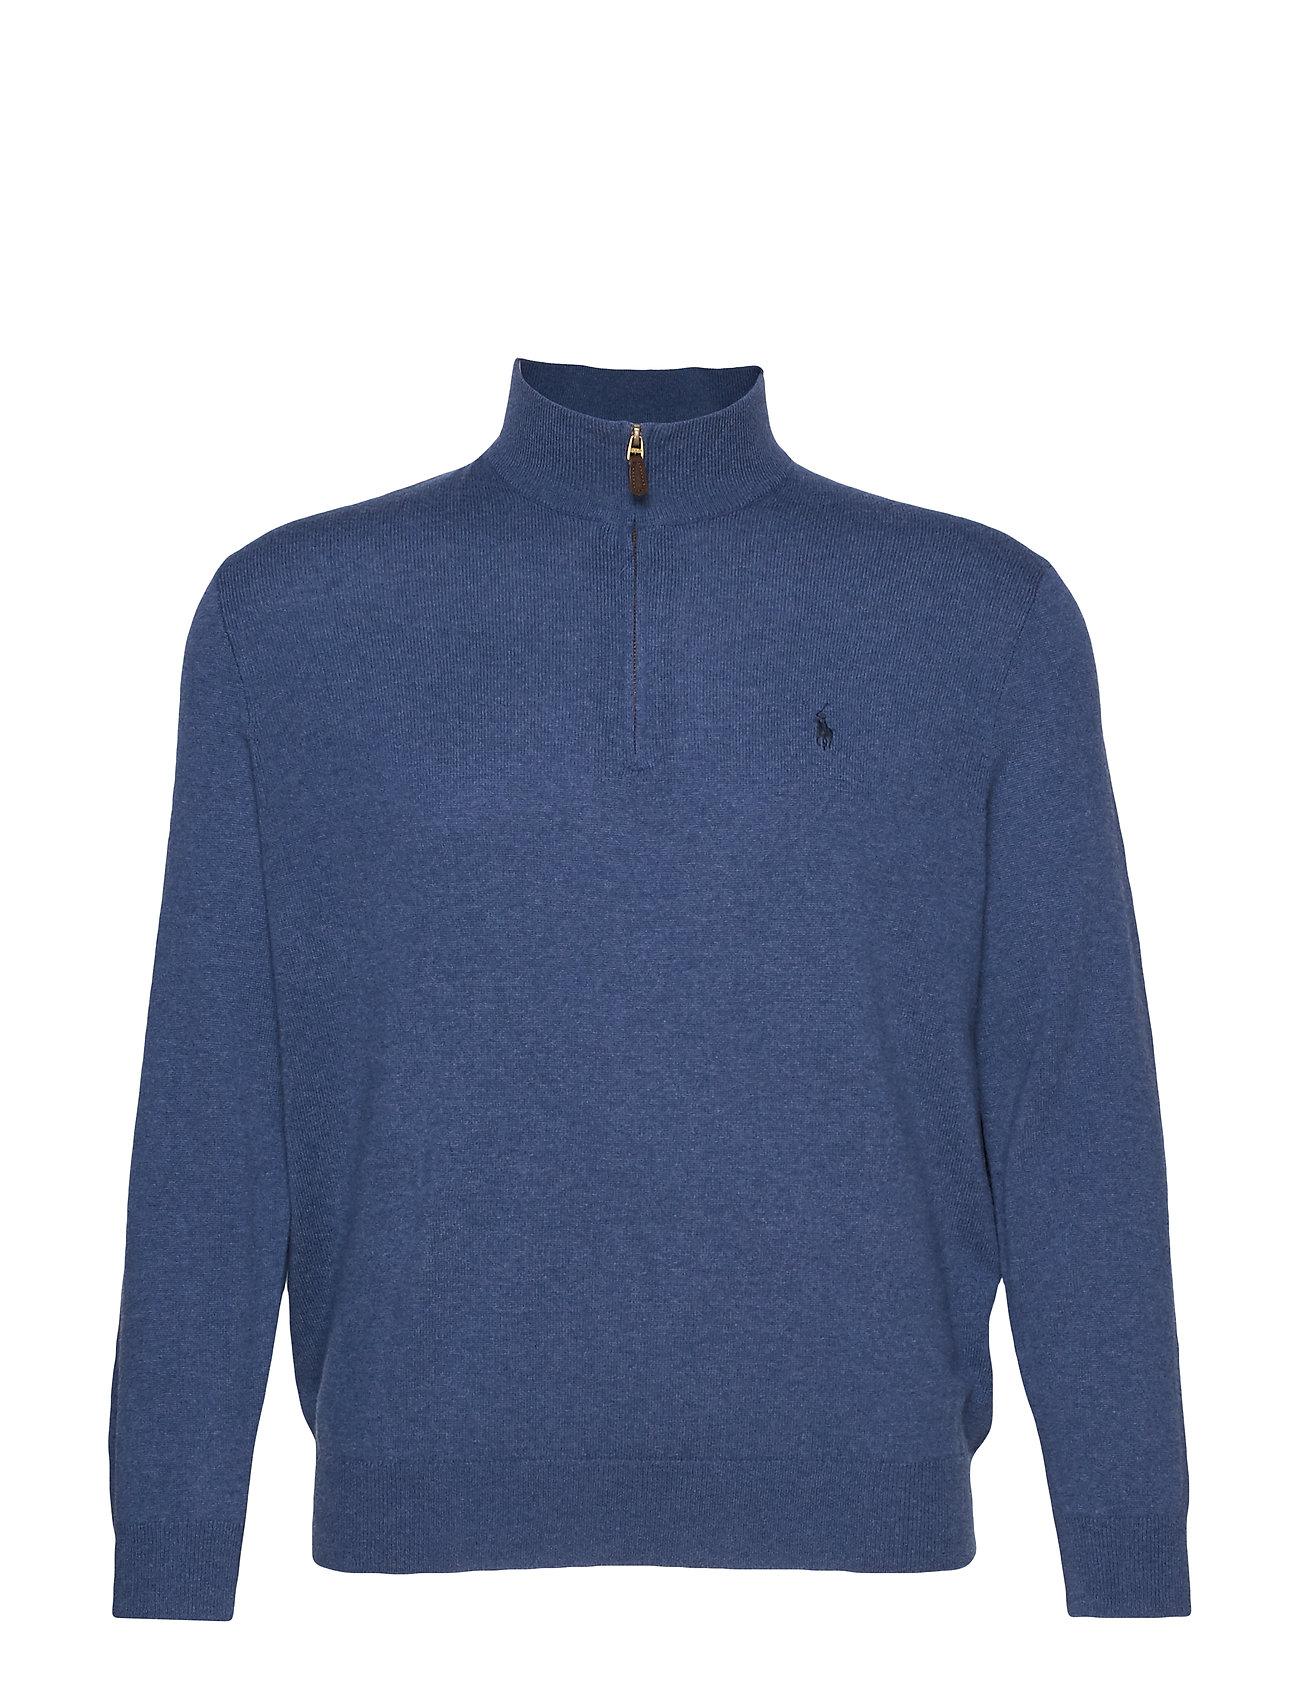 Polo Ralph Lauren Big & Tall Merino Wool Half-Zip Sweater - SHALE BLUE HEATHE